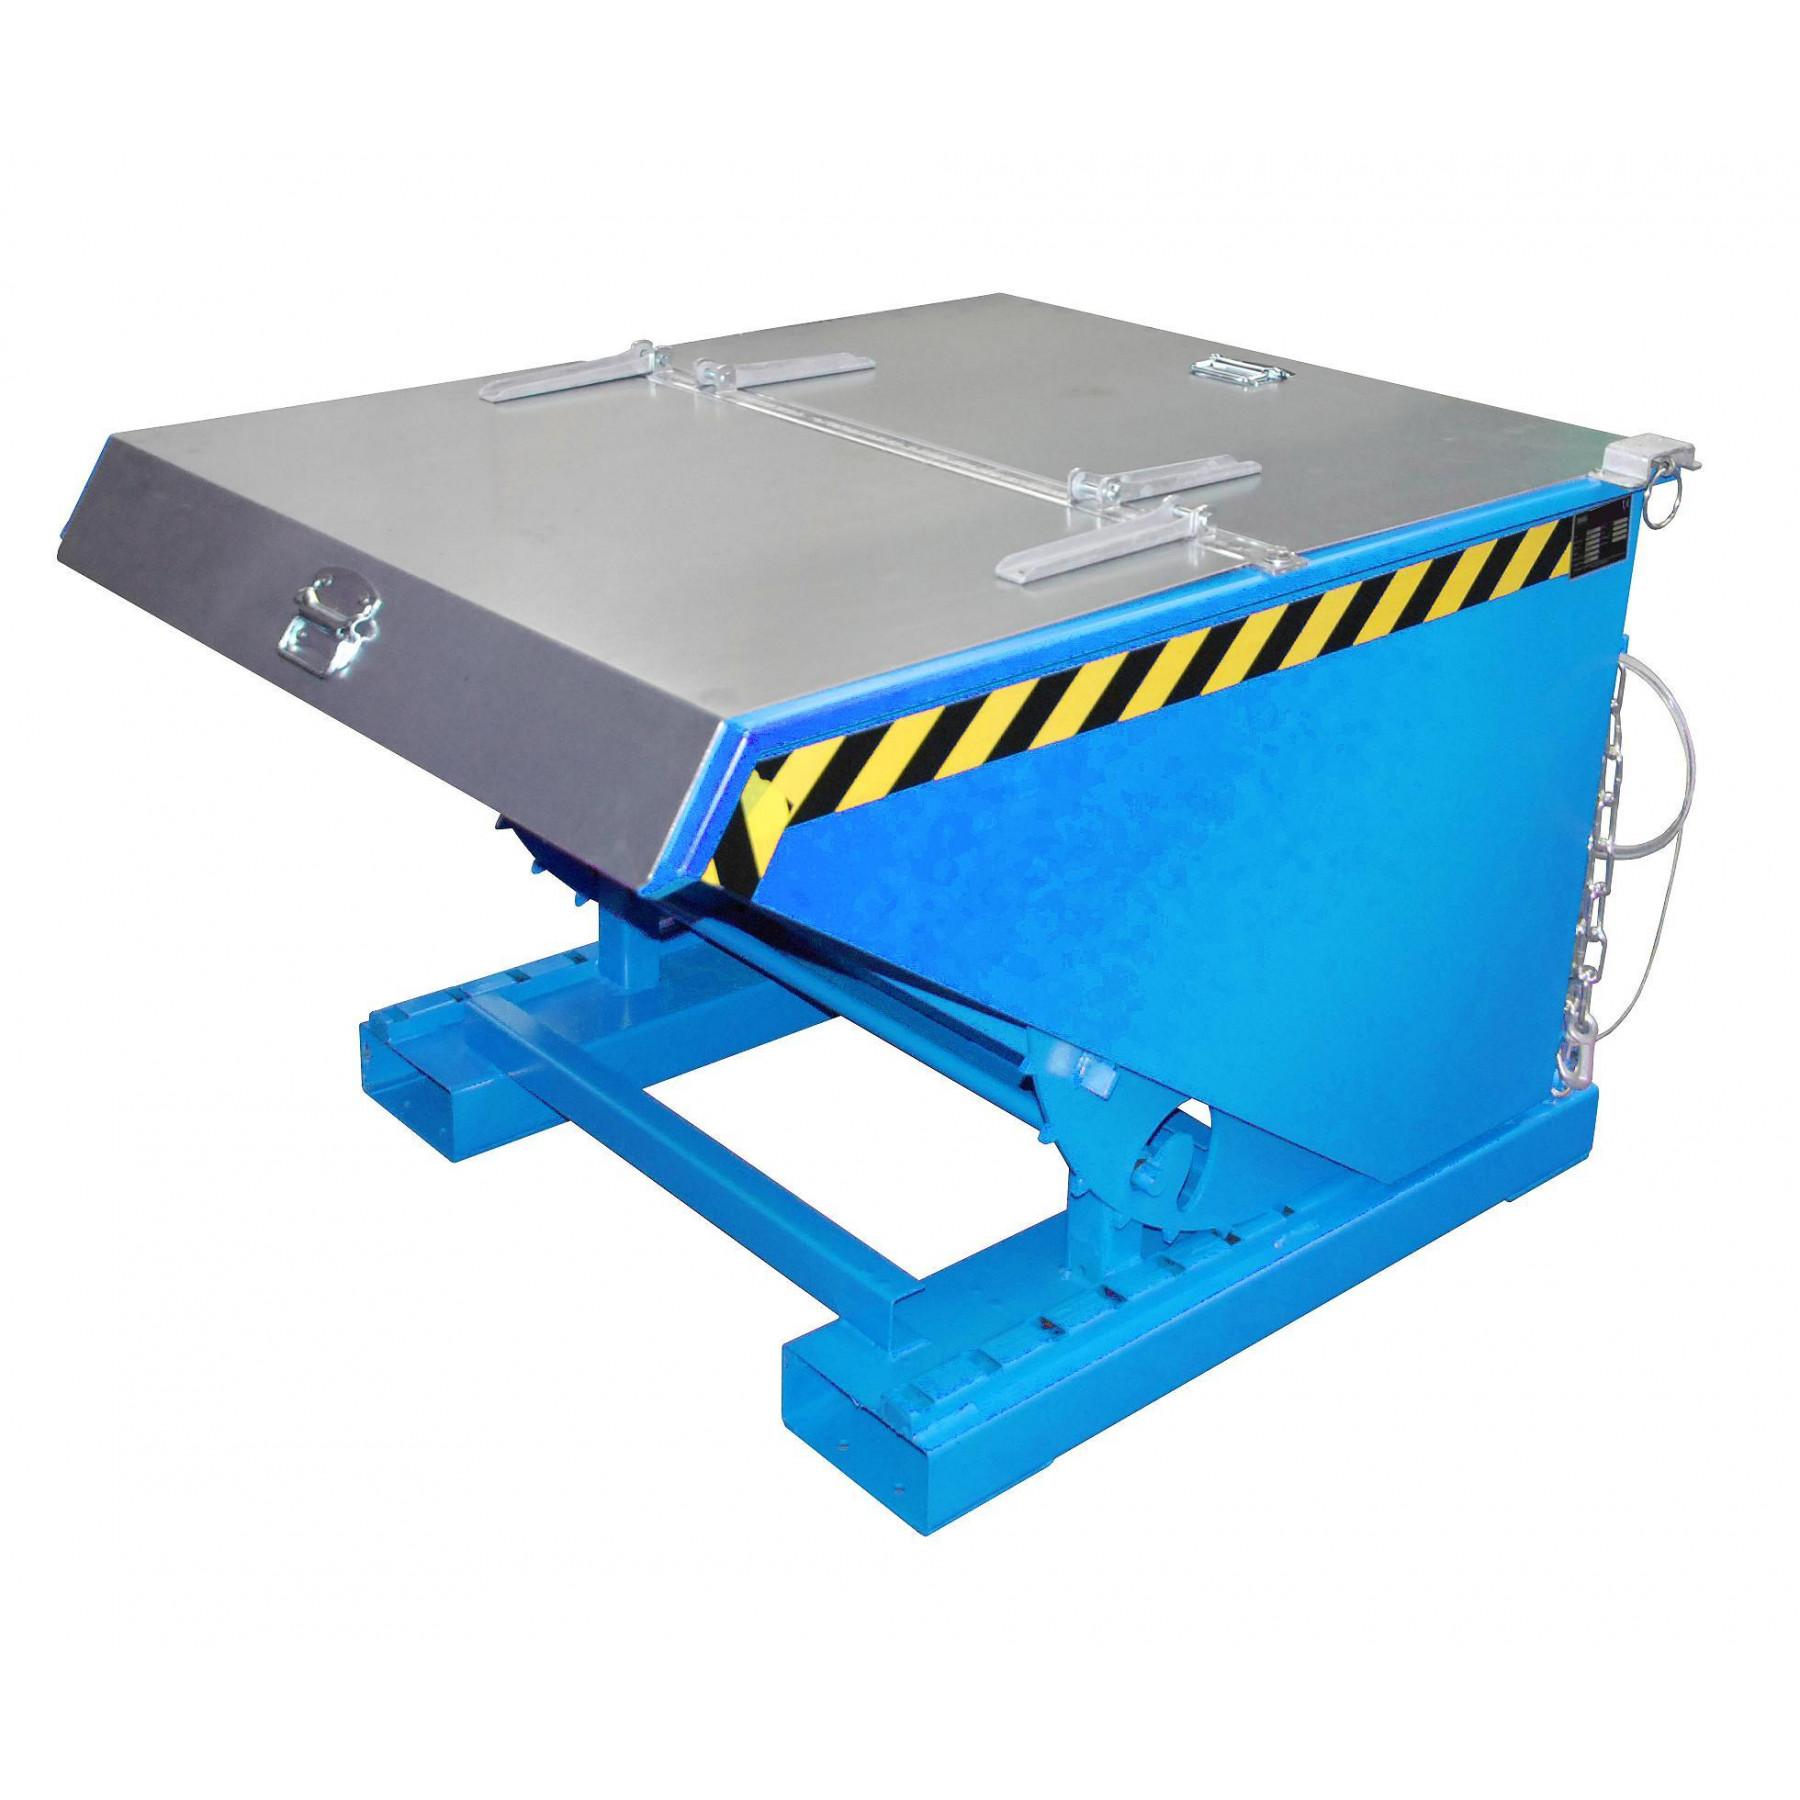 Verzinkt deksel t.b.v. kiepcontainer 600 liter, MTF-600-DEKSEL